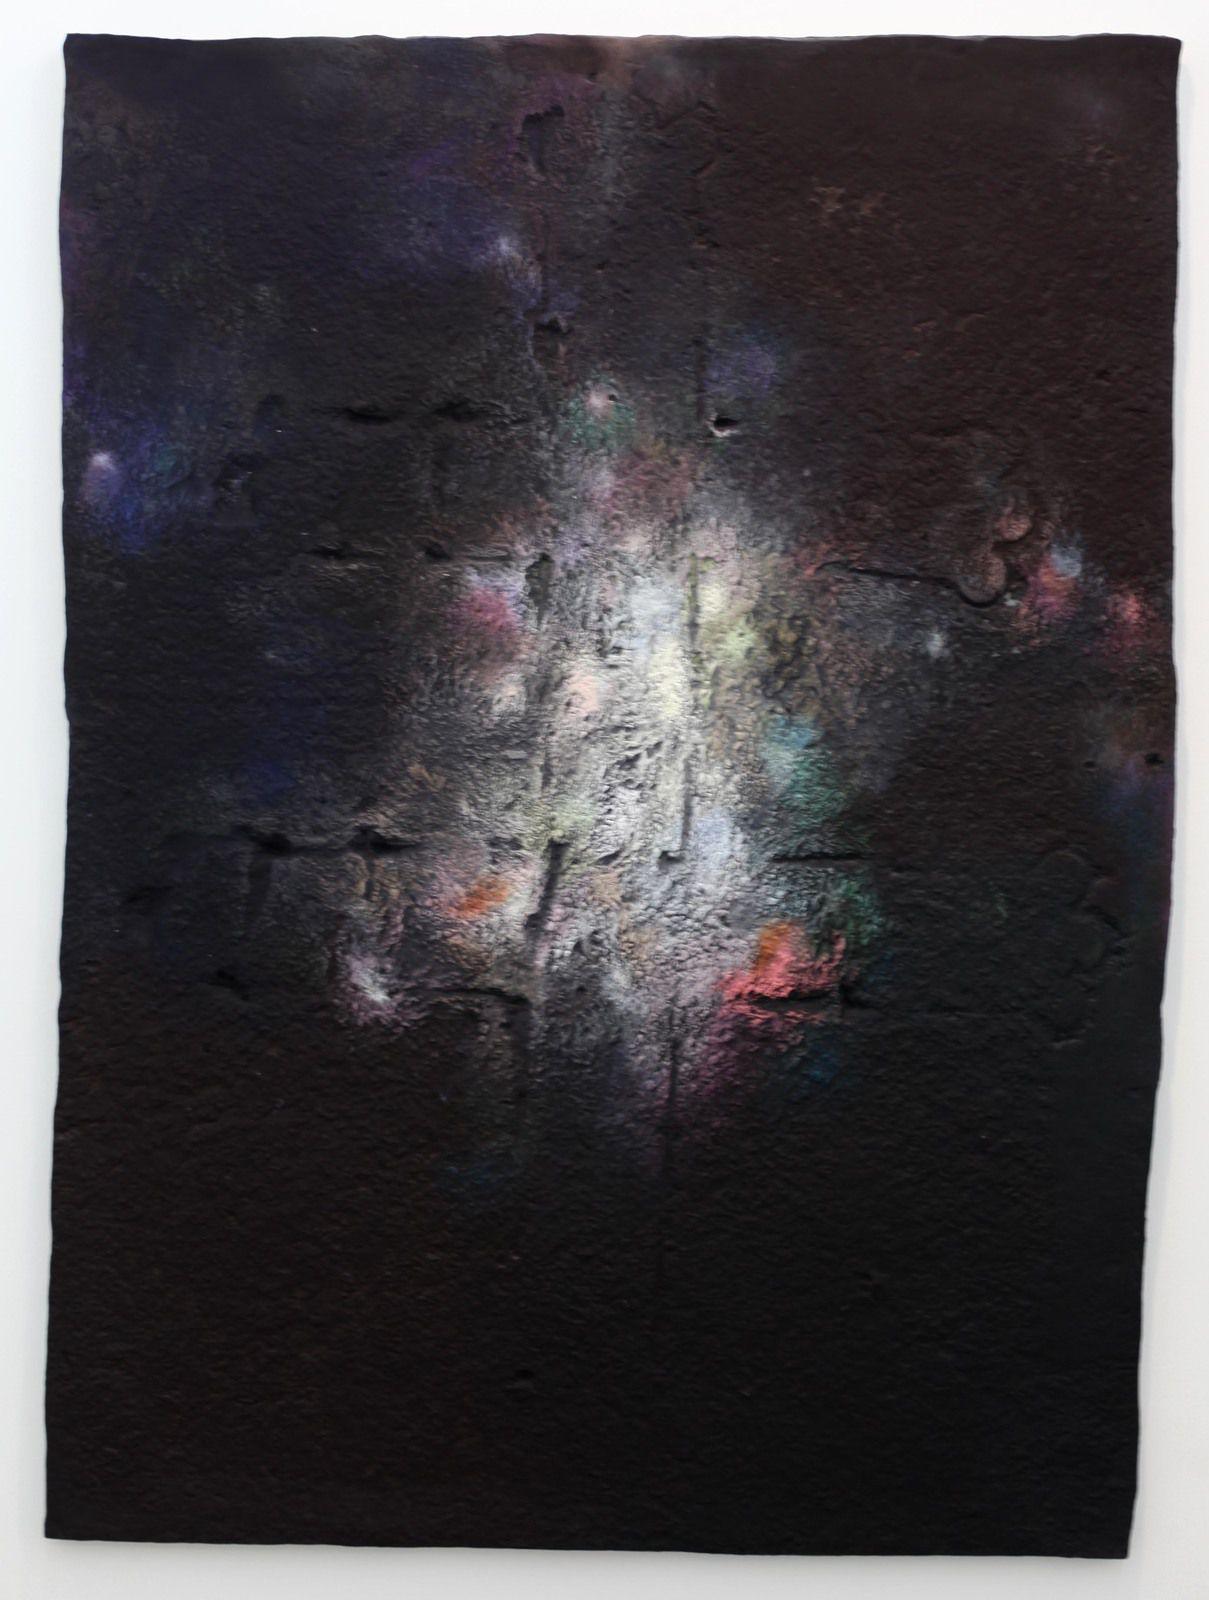 """Offering"", 2019 de Raul ILLARRAMENDI - Courtesy Galerie KARSTEN GREVE PARIS © Photo Éric Simon"